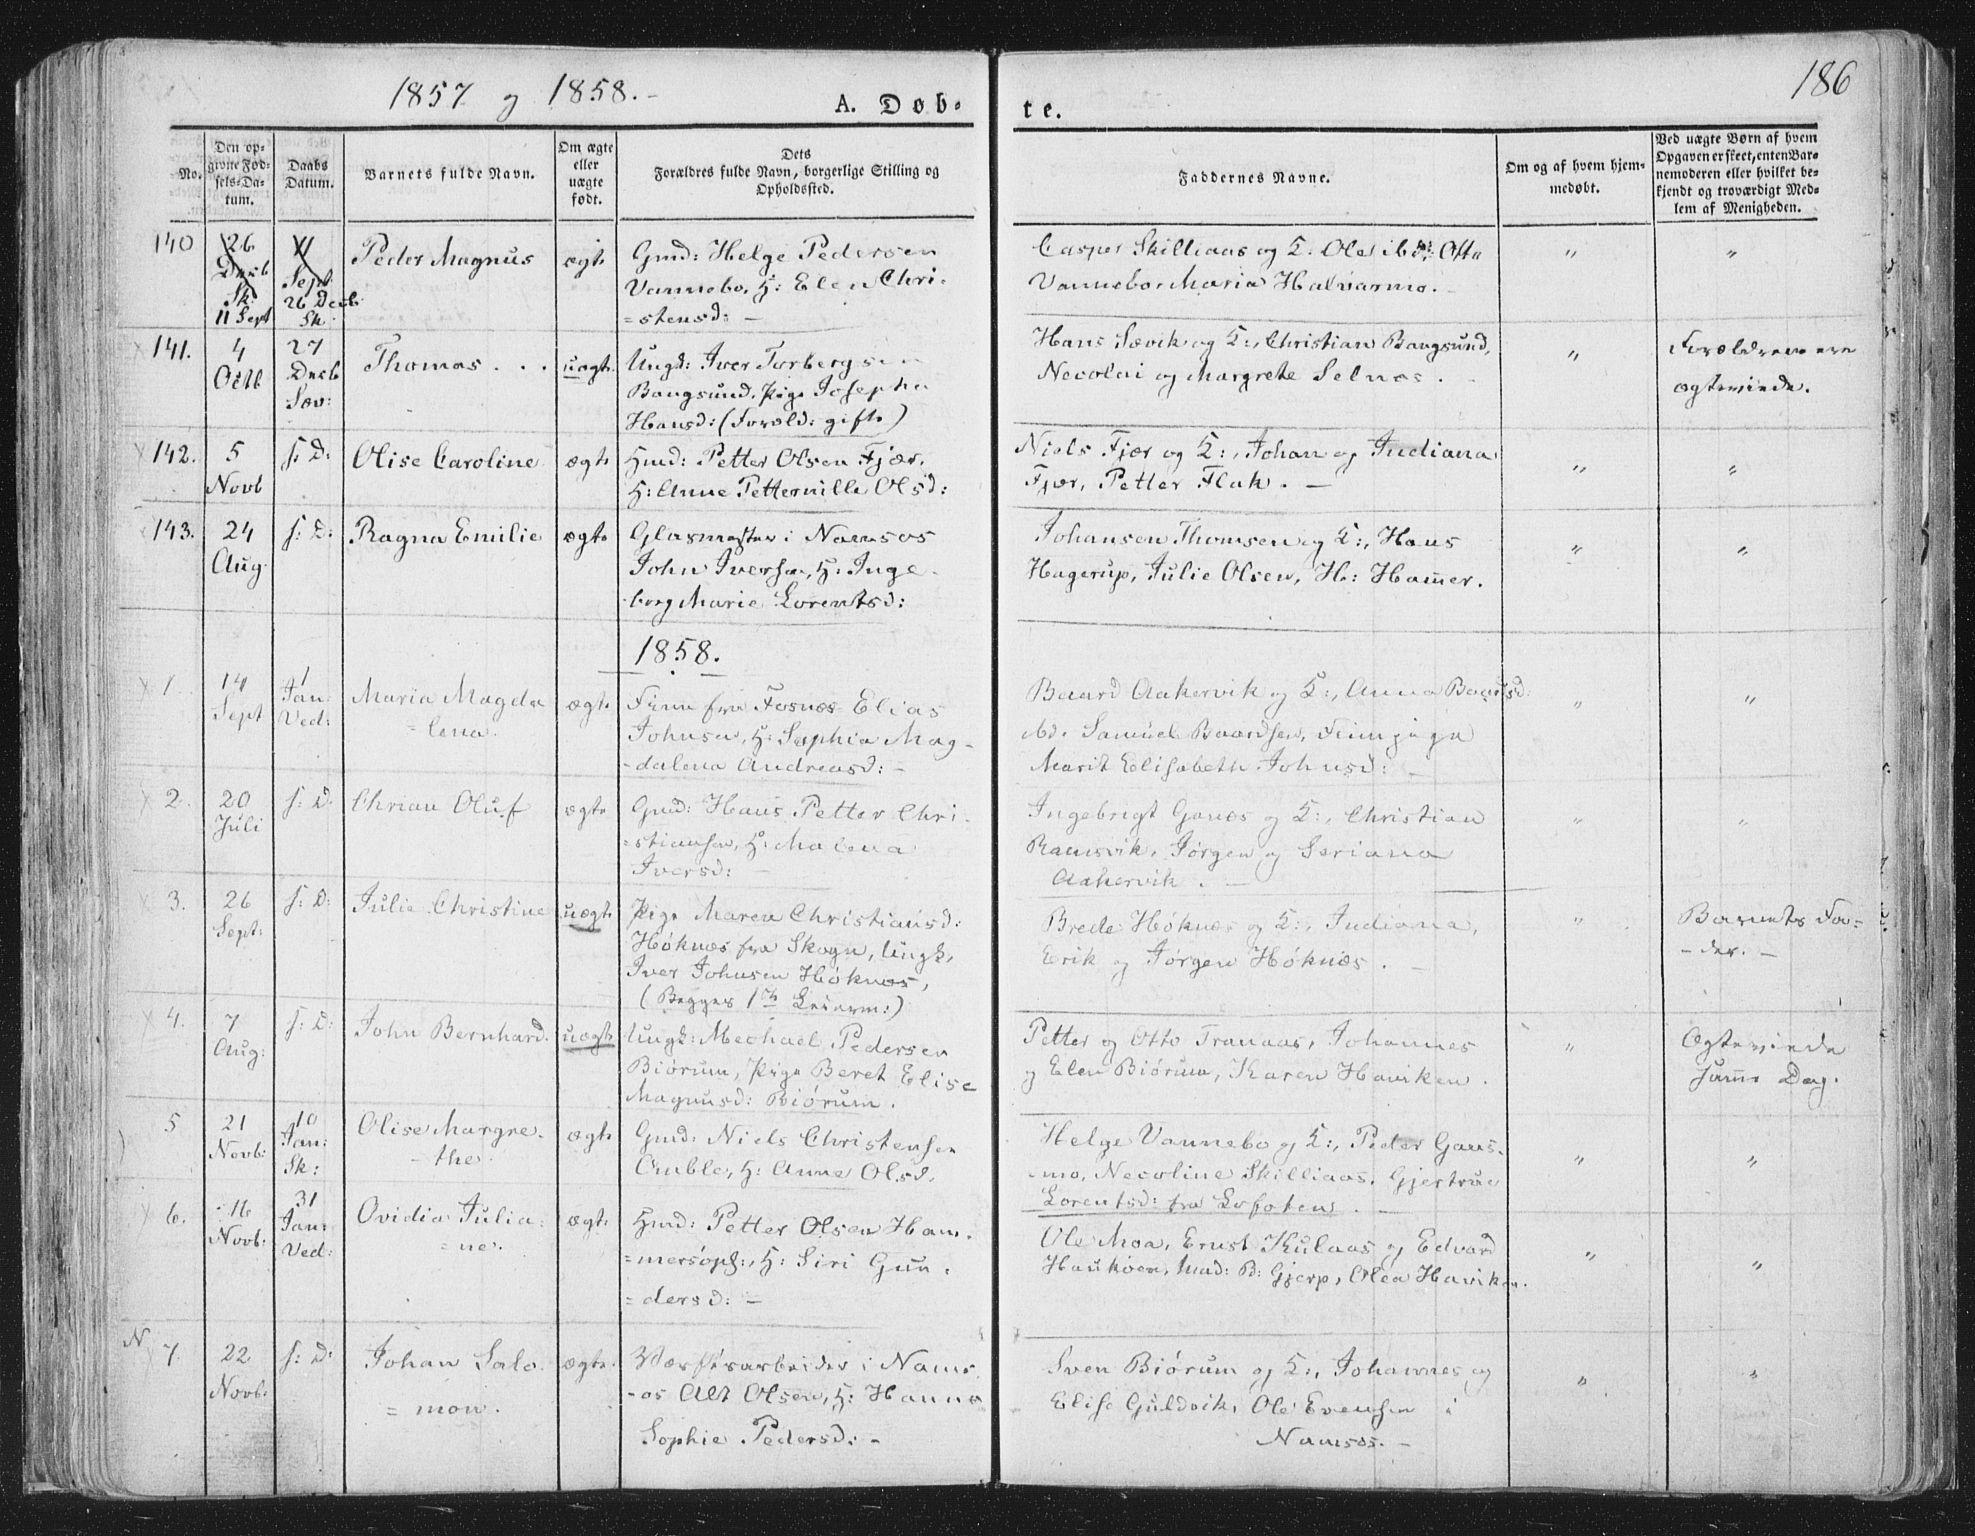 SAT, Ministerialprotokoller, klokkerbøker og fødselsregistre - Nord-Trøndelag, 764/L0551: Ministerialbok nr. 764A07a, 1824-1864, s. 186